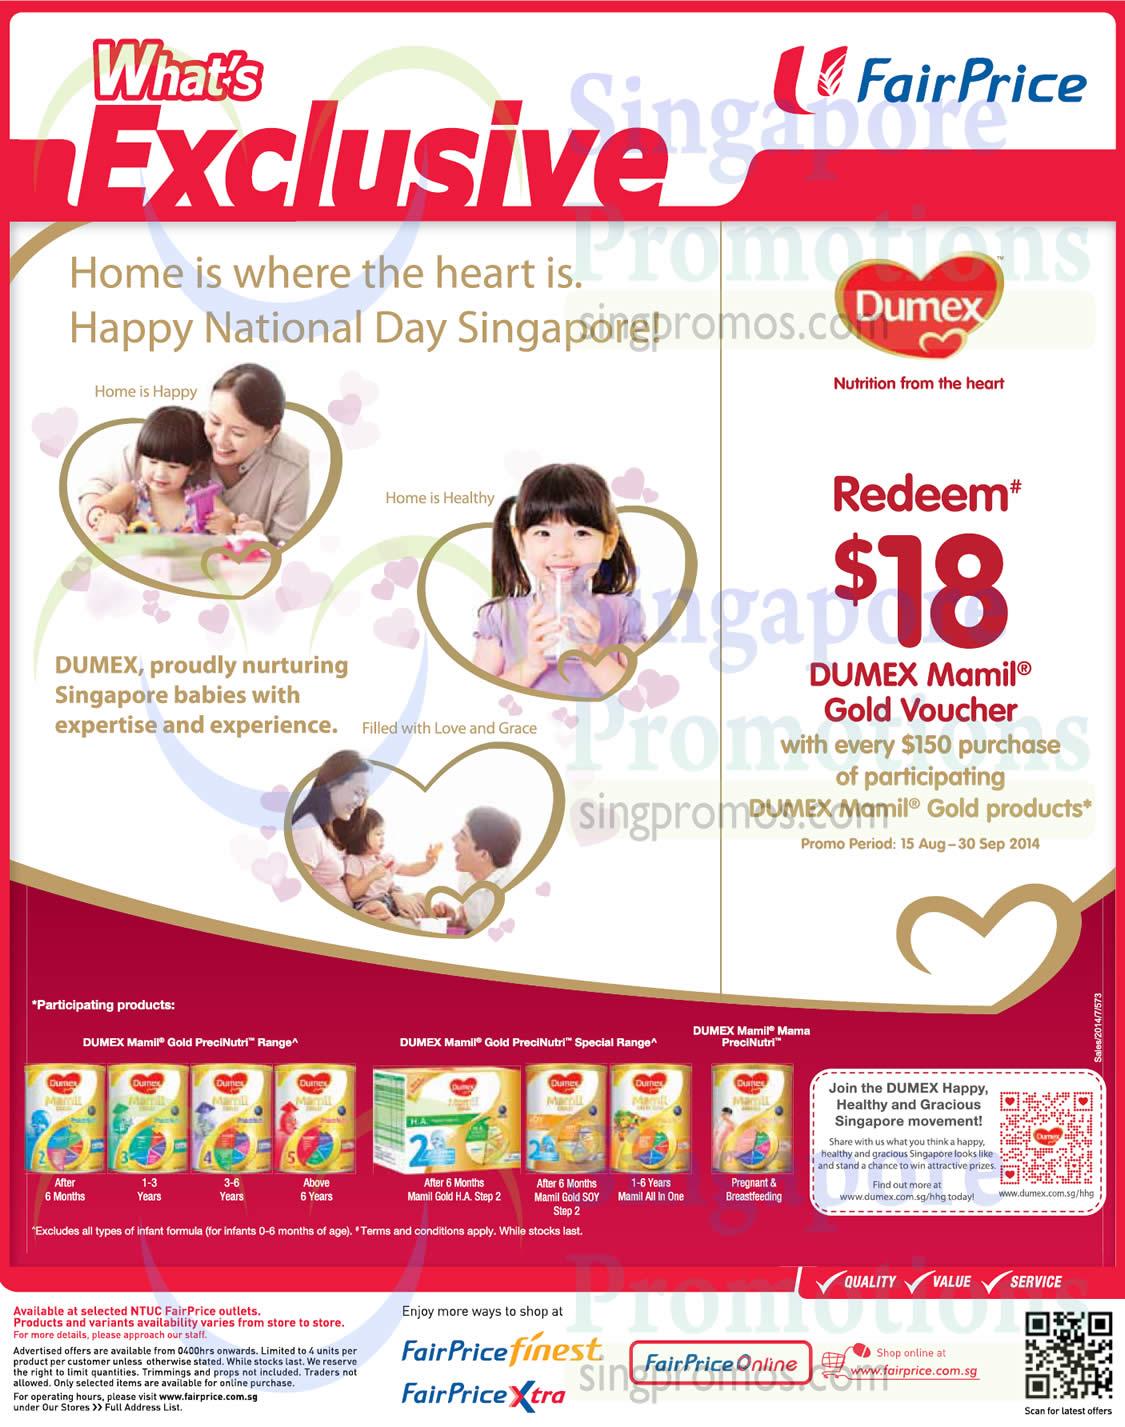 Baby Gift Ntuc : Dumex spend get voucher ntuc fairprice aug